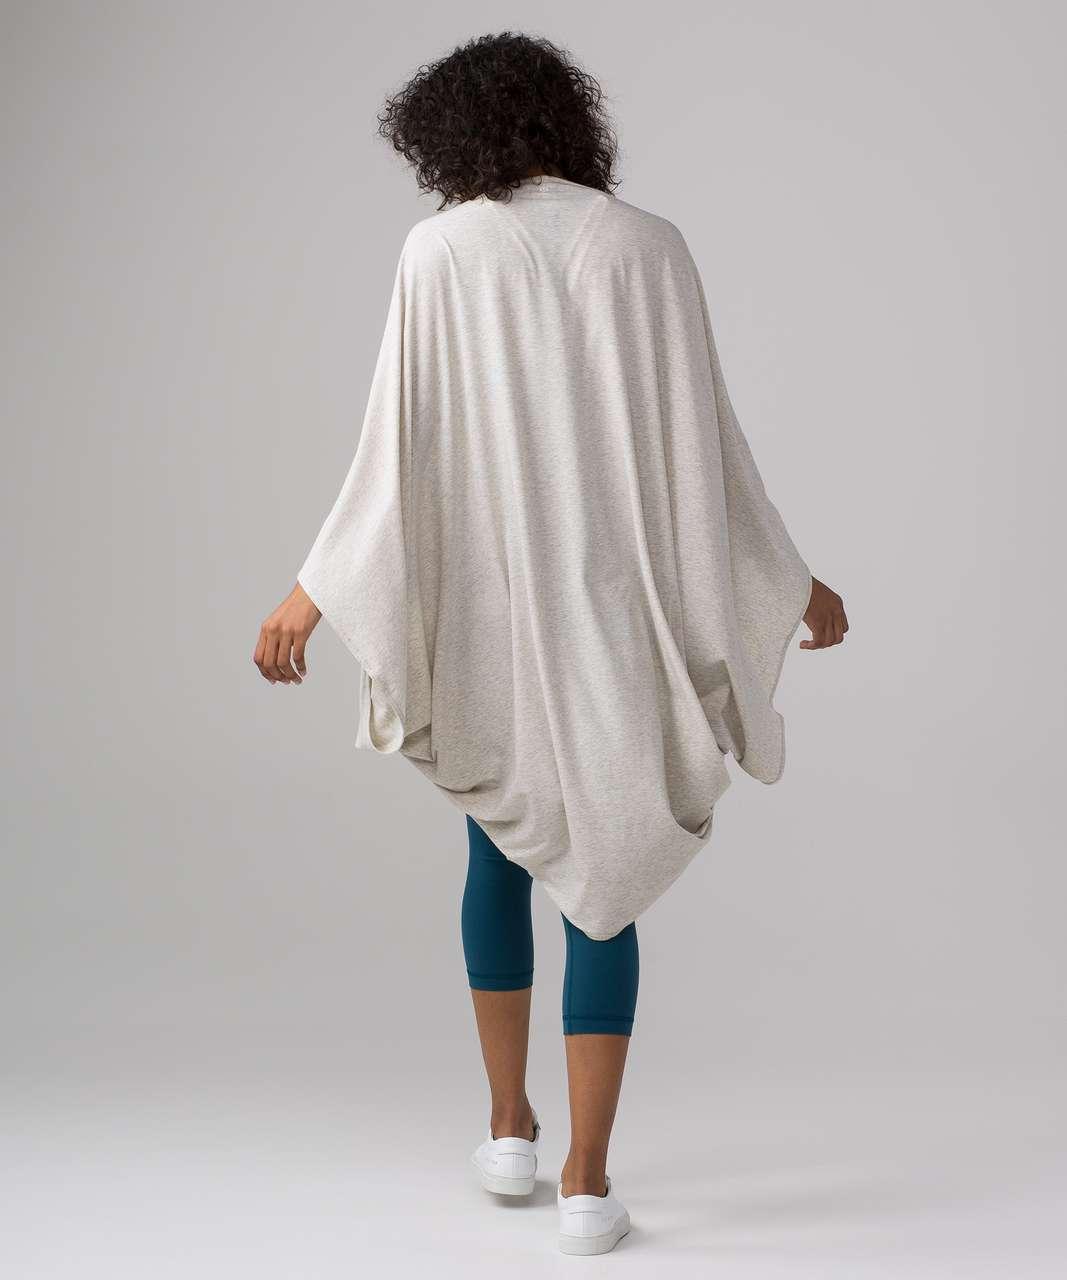 Lululemon Sage Scarf (Cotton) - Heathered Light Grey